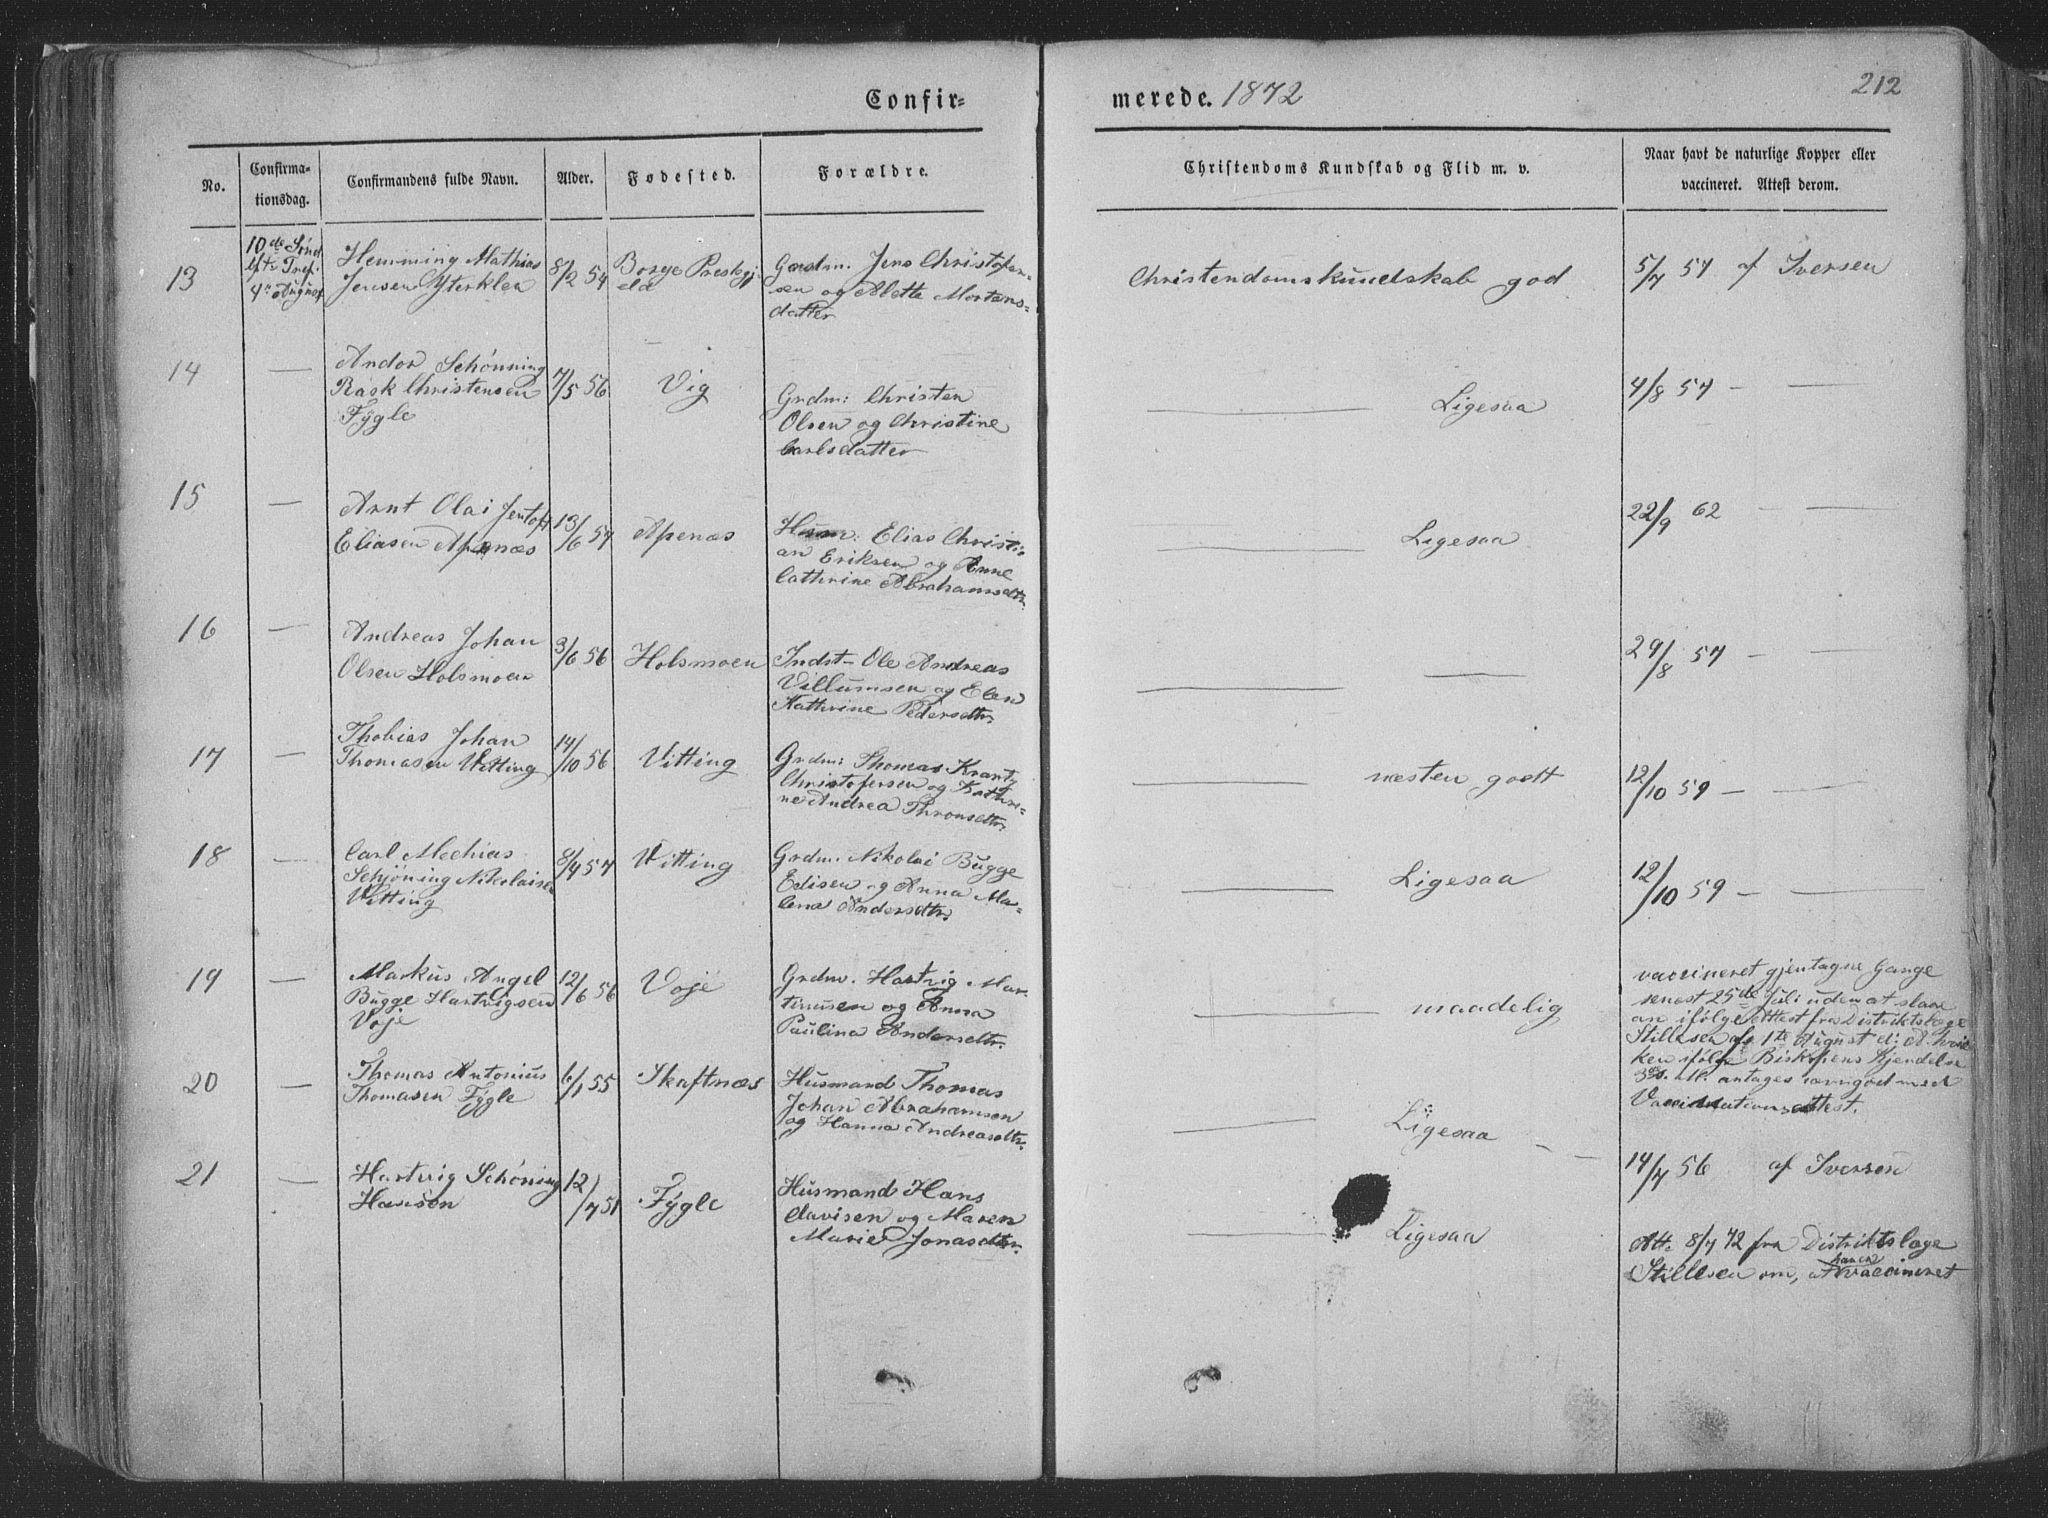 SAT, Ministerialprotokoller, klokkerbøker og fødselsregistre - Nordland, 881/L1165: Klokkerbok nr. 881C02, 1854-1876, s. 212